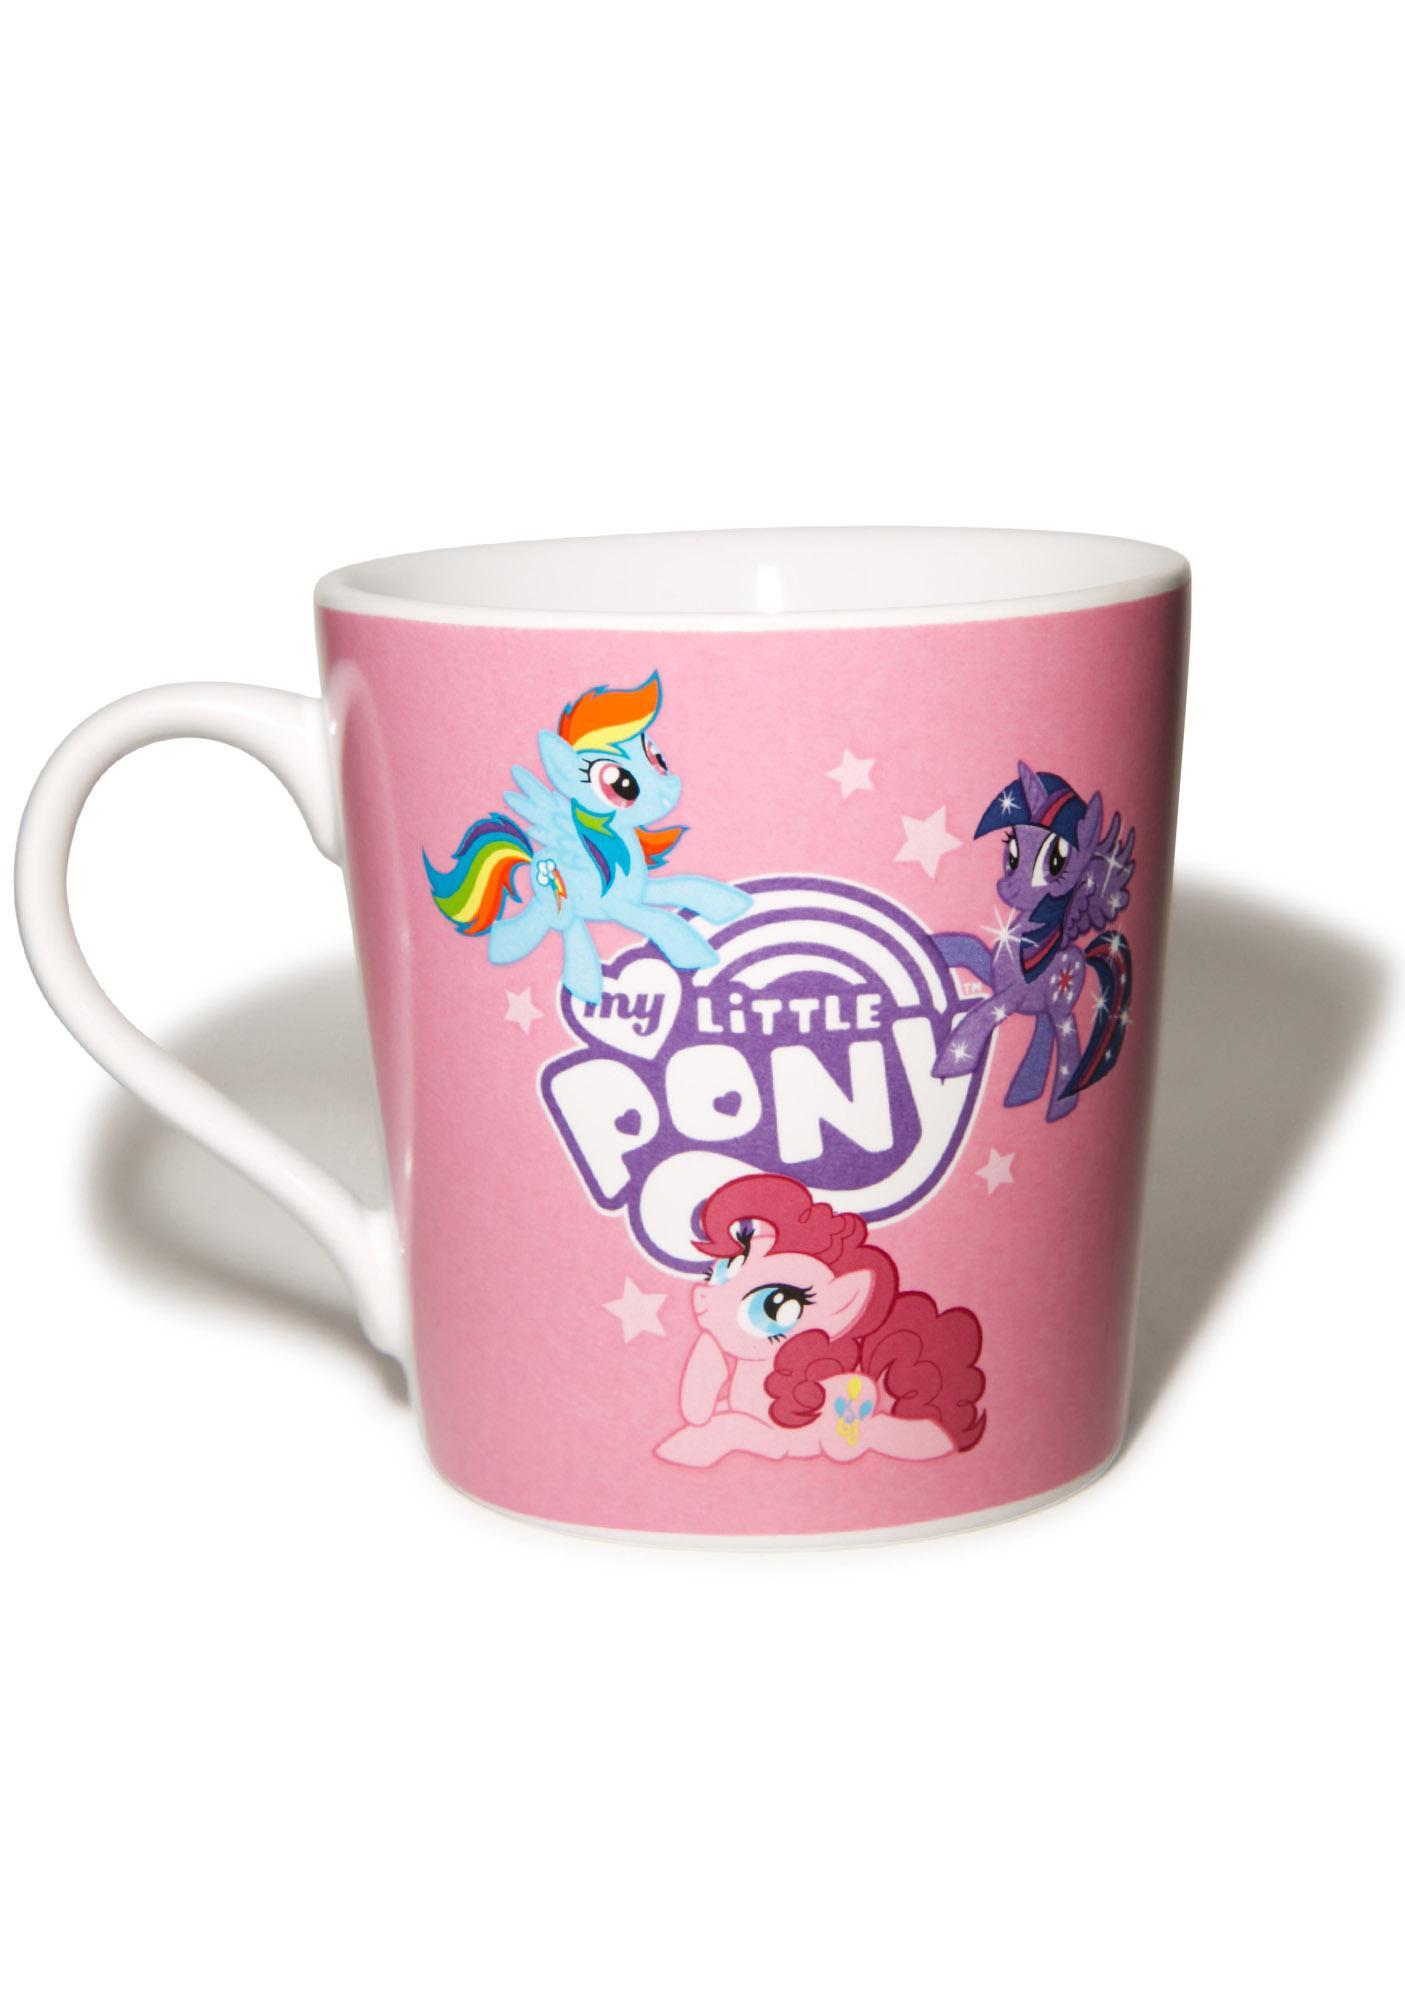 My Little Pony Ceramic Mug